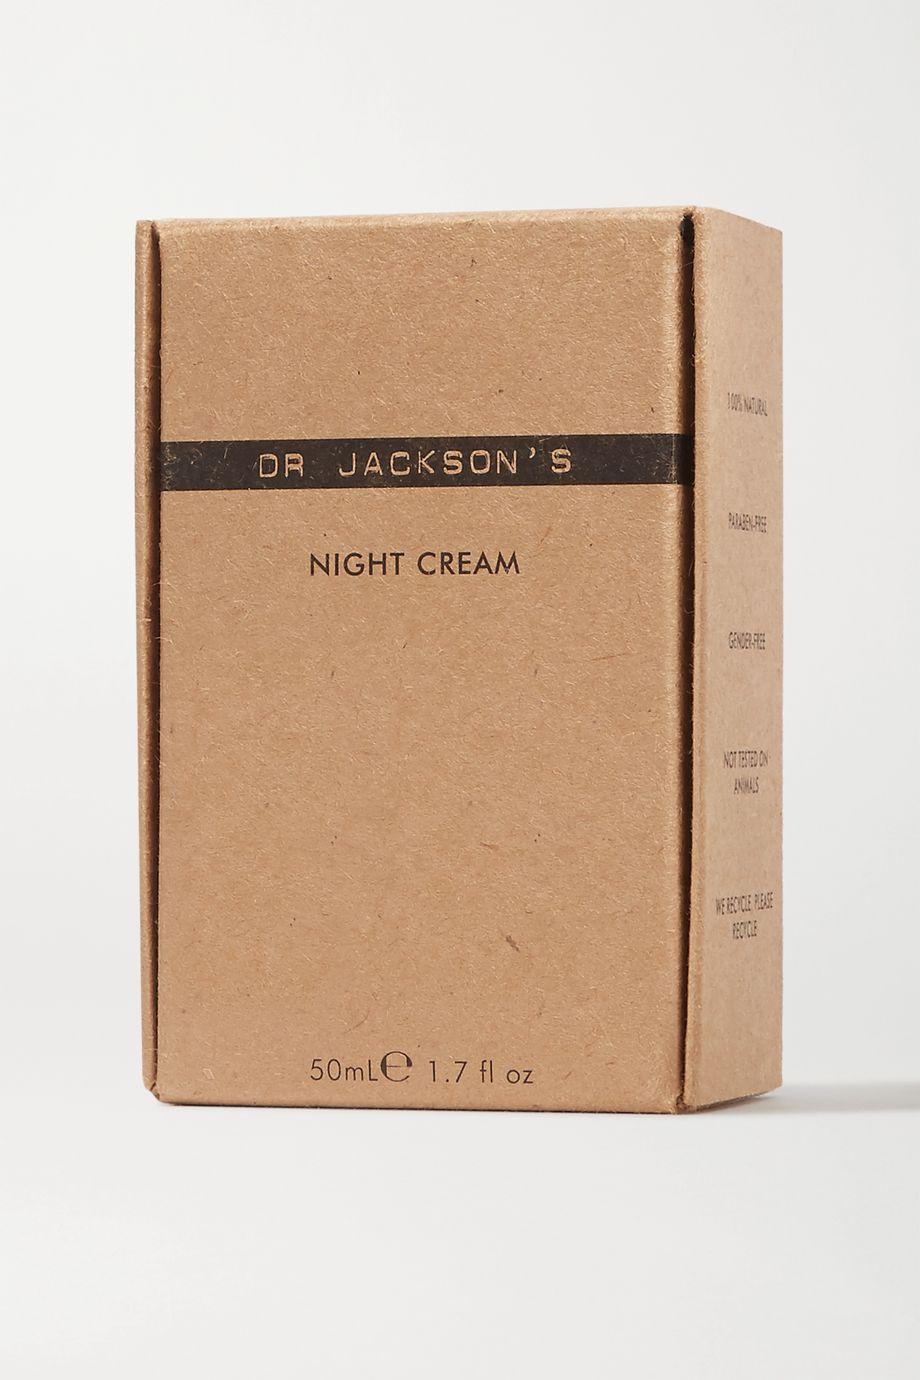 Dr. Jackson's 02 Night Cream, 50ml